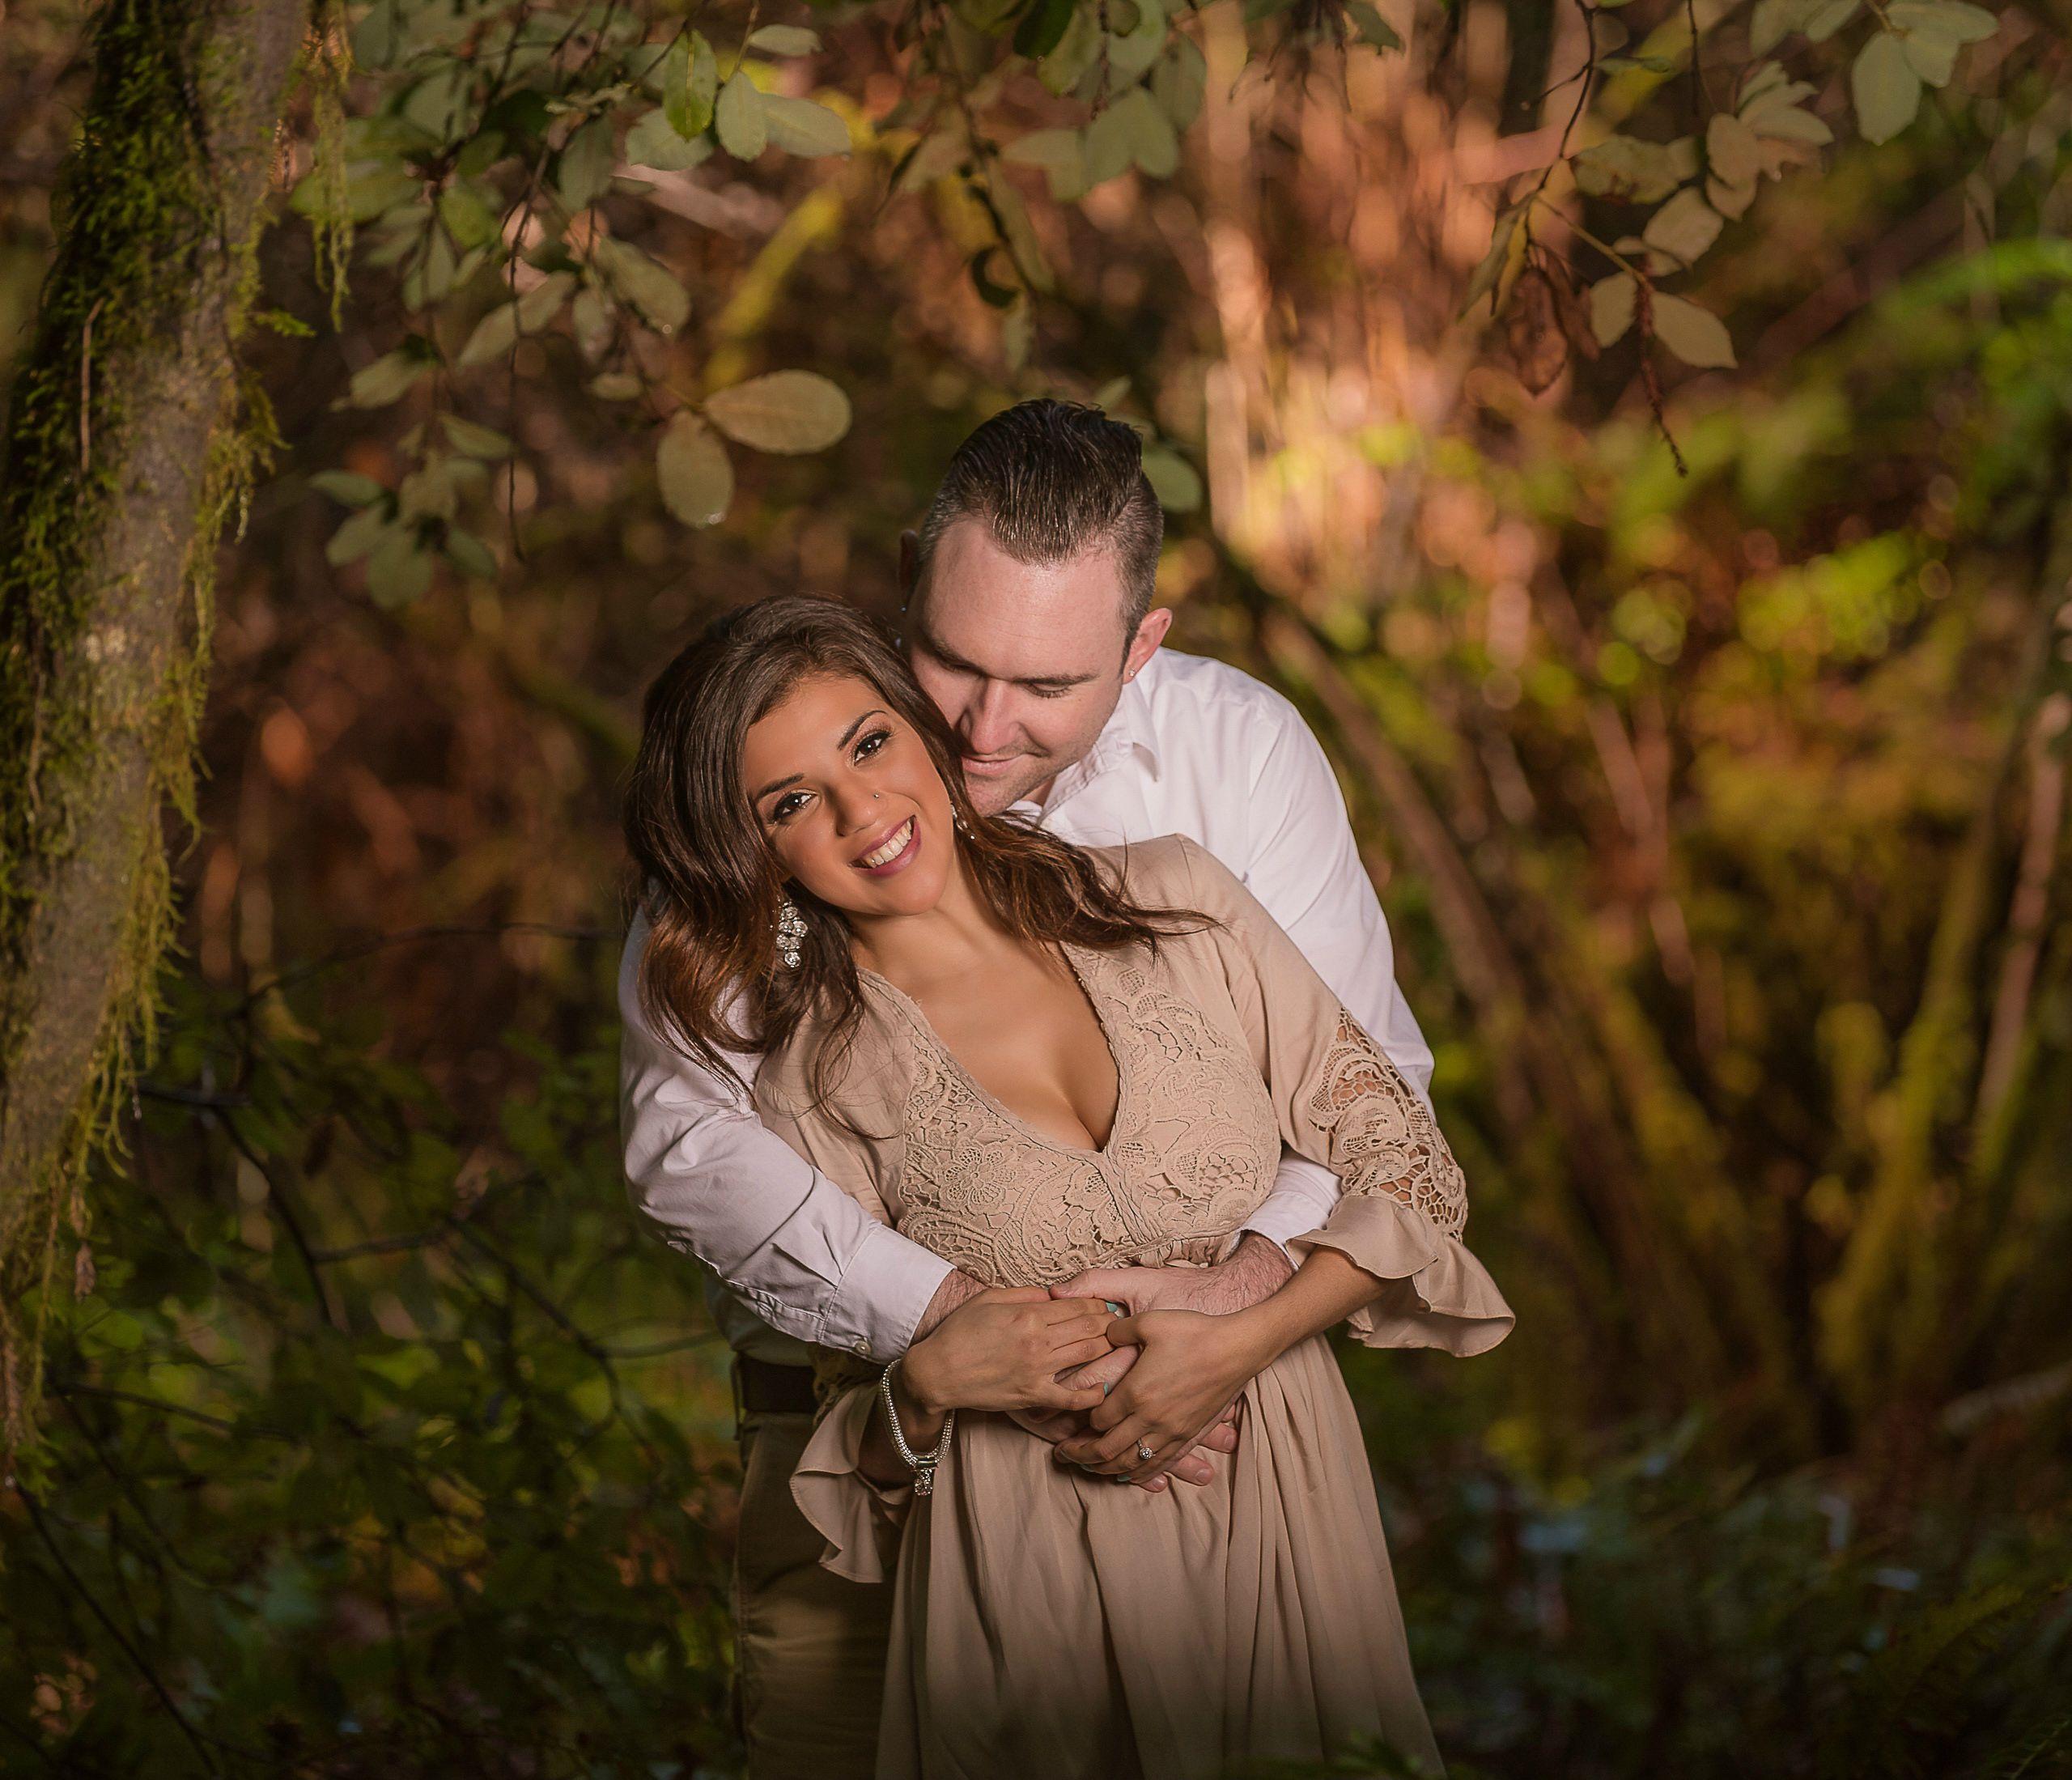 Humboldt ca dating hook up met suiker mummies in Kenia